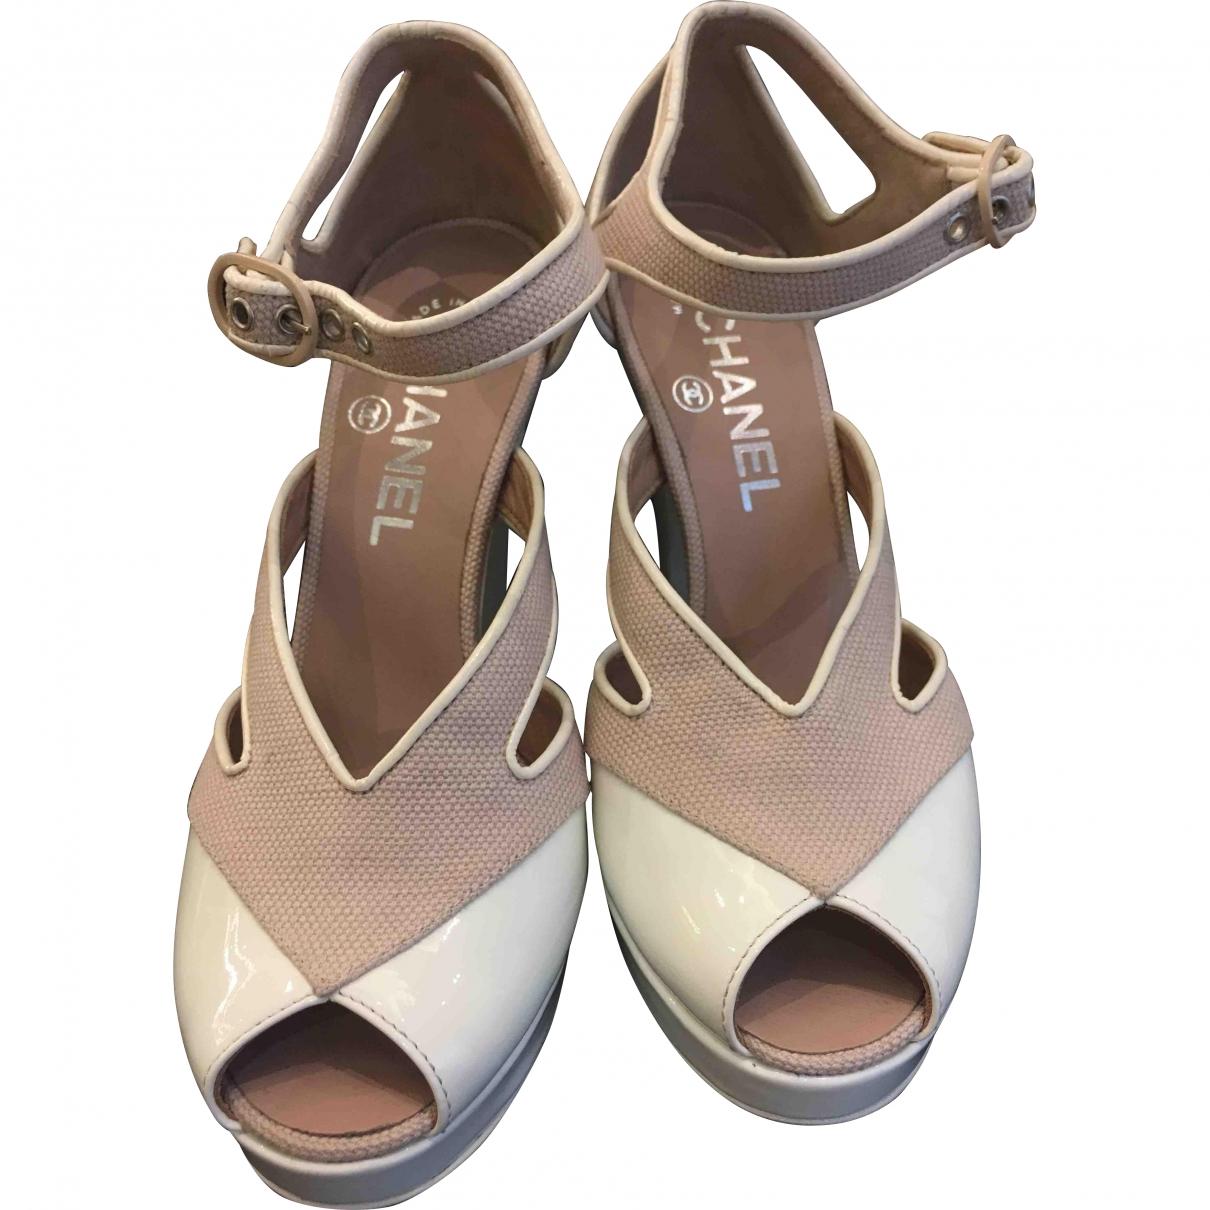 Chanel \N Beige Cloth Heels for Women 35.5 EU